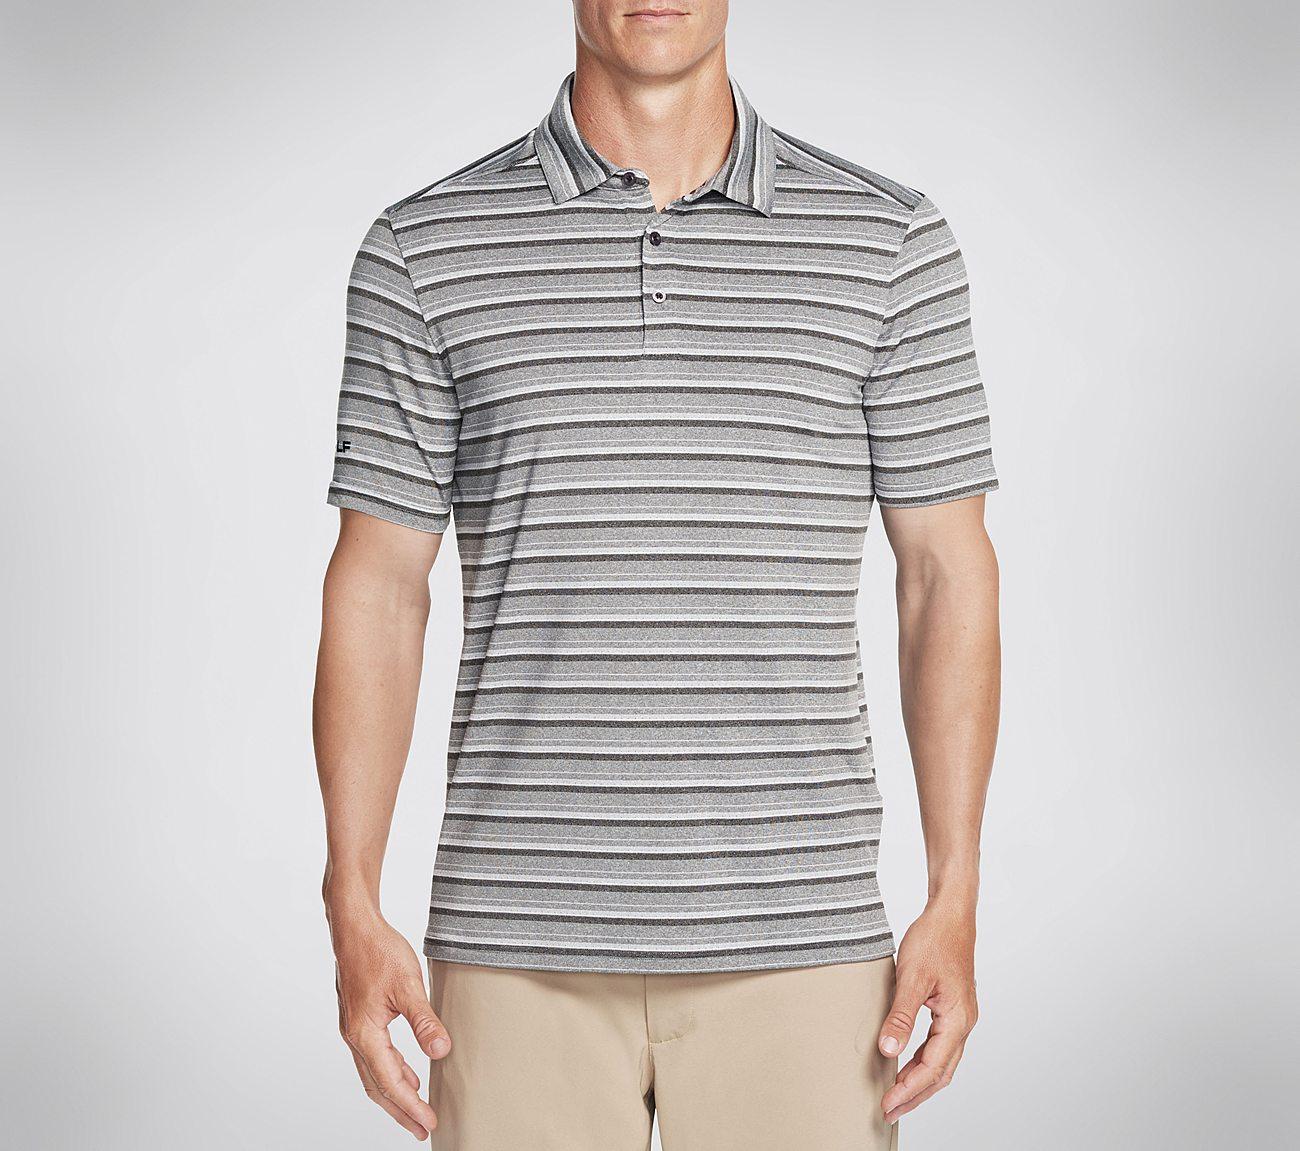 Skechers GOGOLF Approach Stripe Polo Shirt